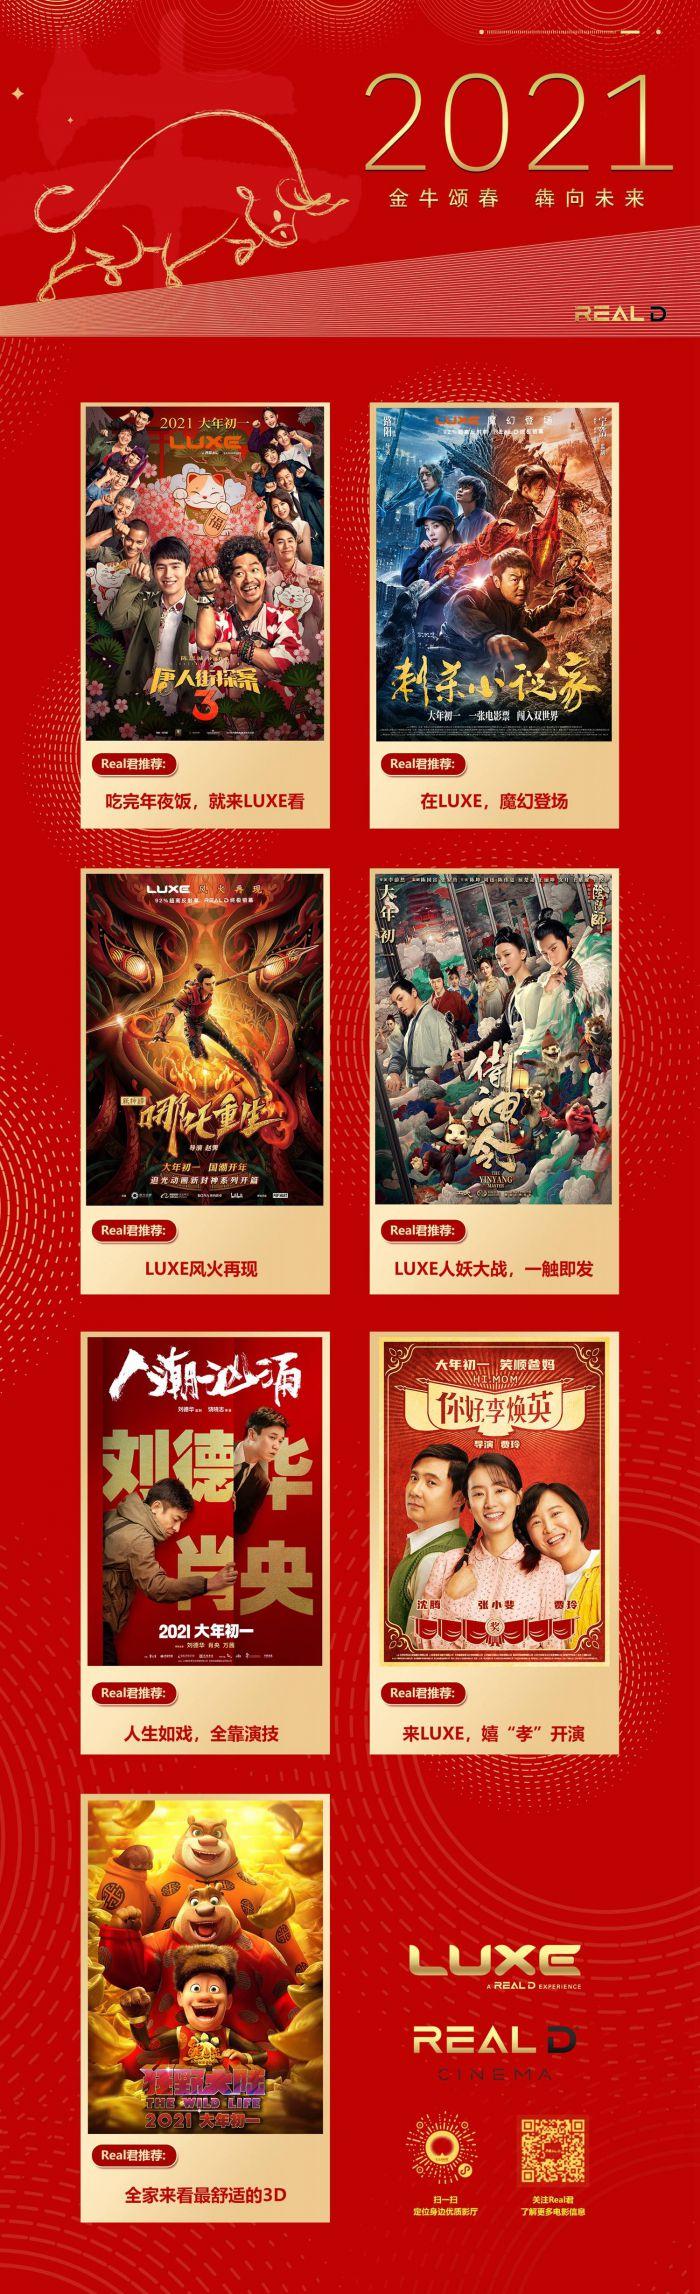 RealD LUXE春节档观影指南  唐探&小说家&侍神令!